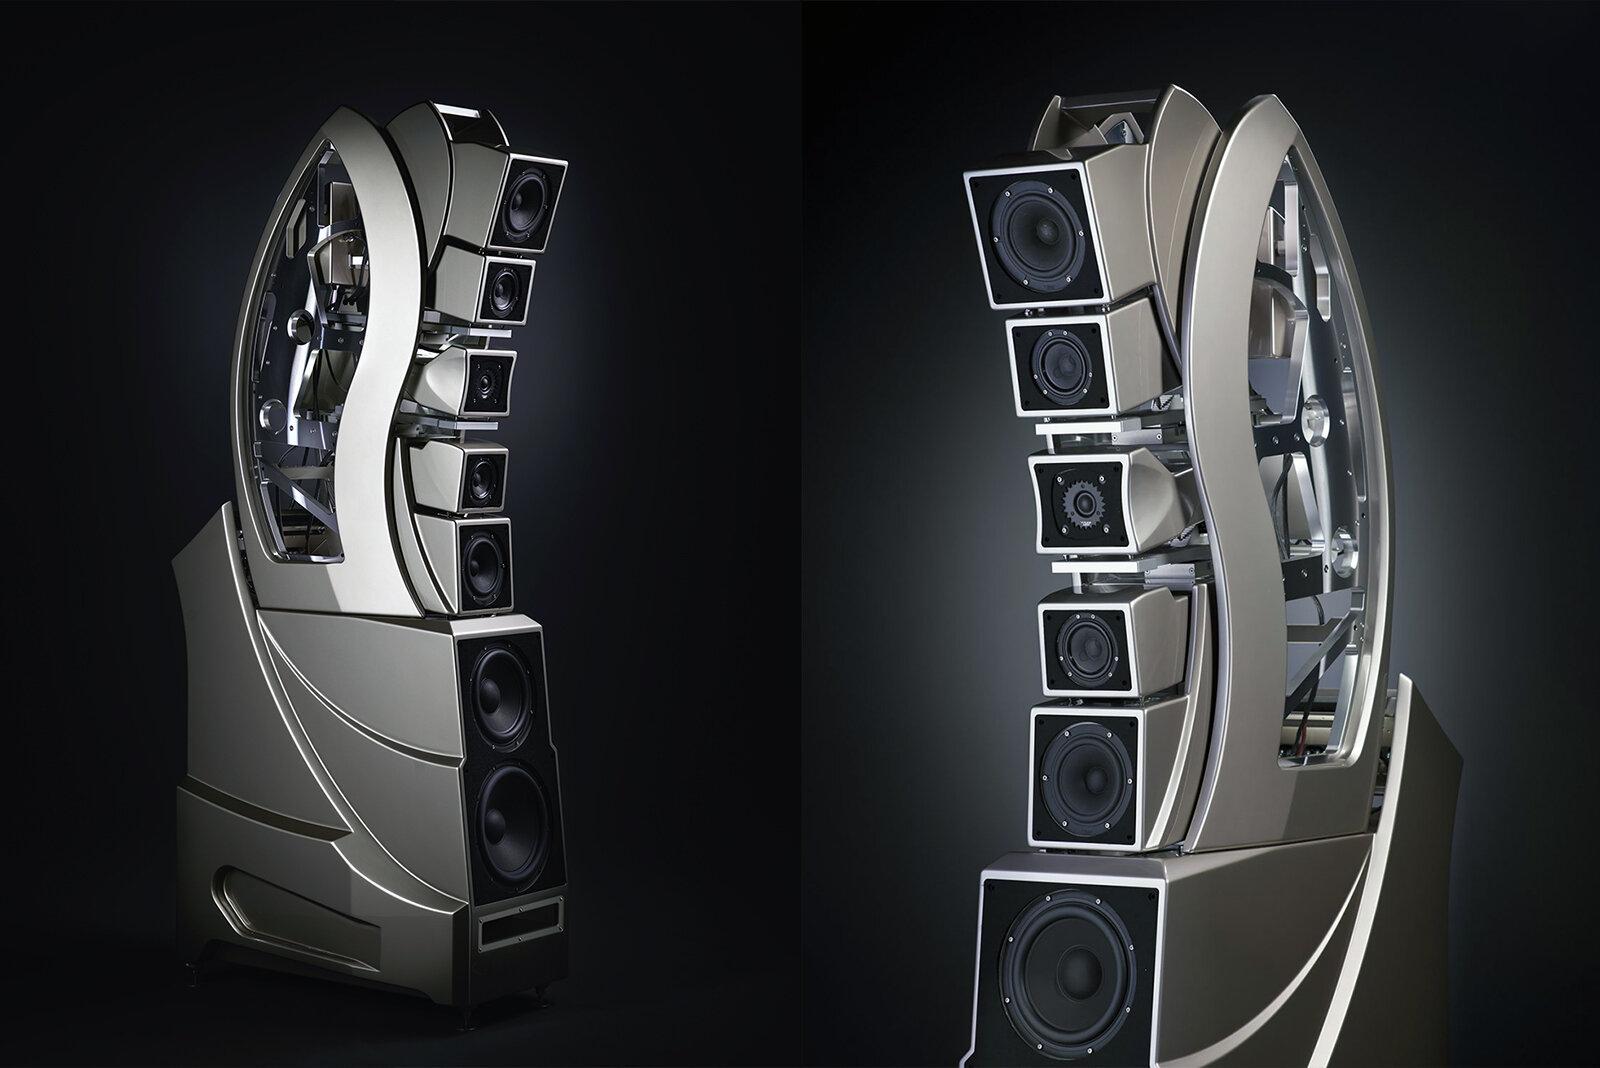 Cận cảnh chiếc loa Wilson Audio WAMM Master Chronosonic tinh xảo